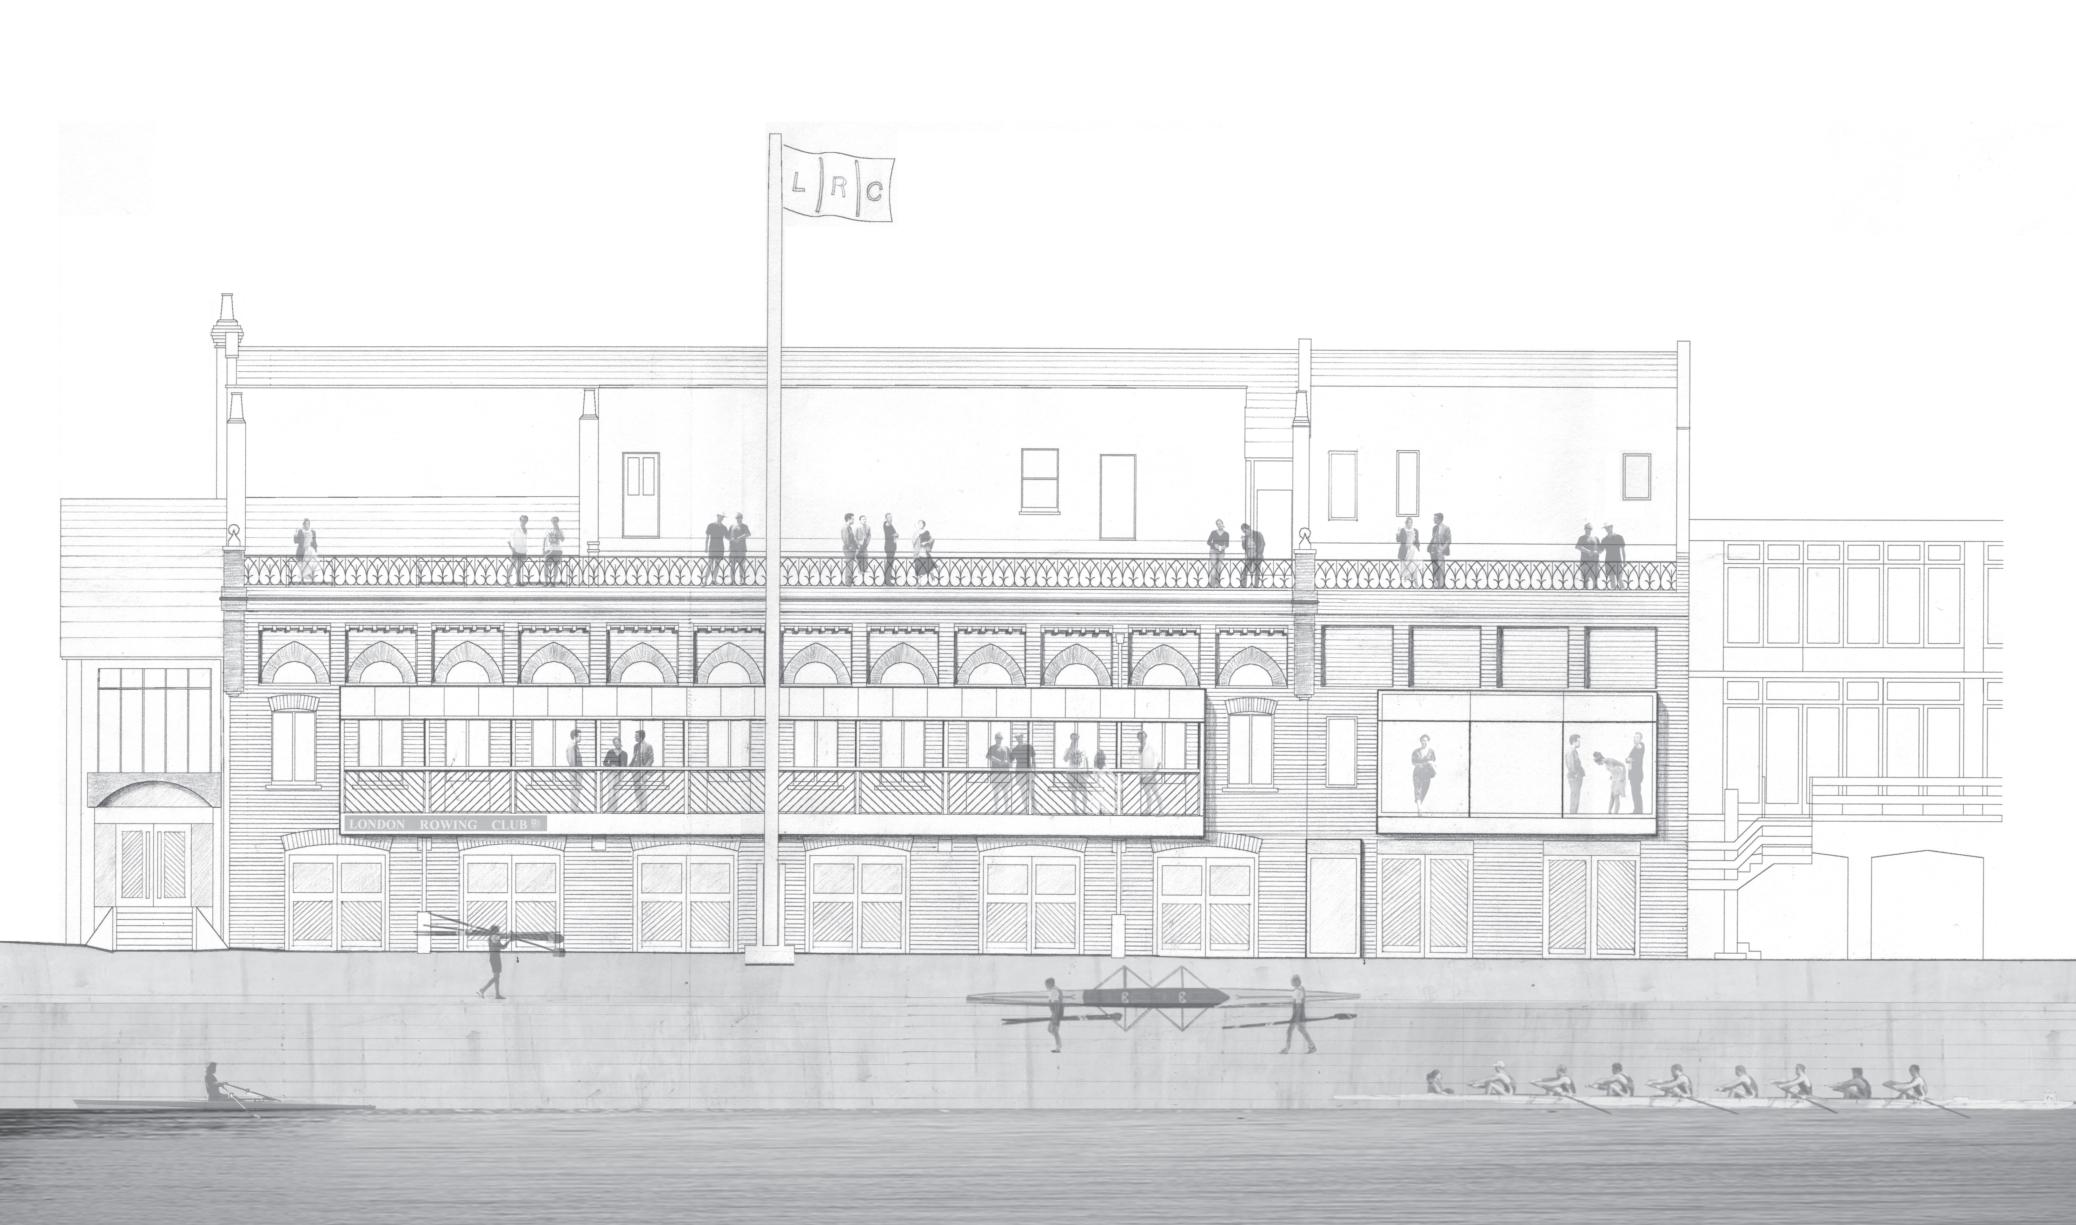 London Rowing Club sketch 1